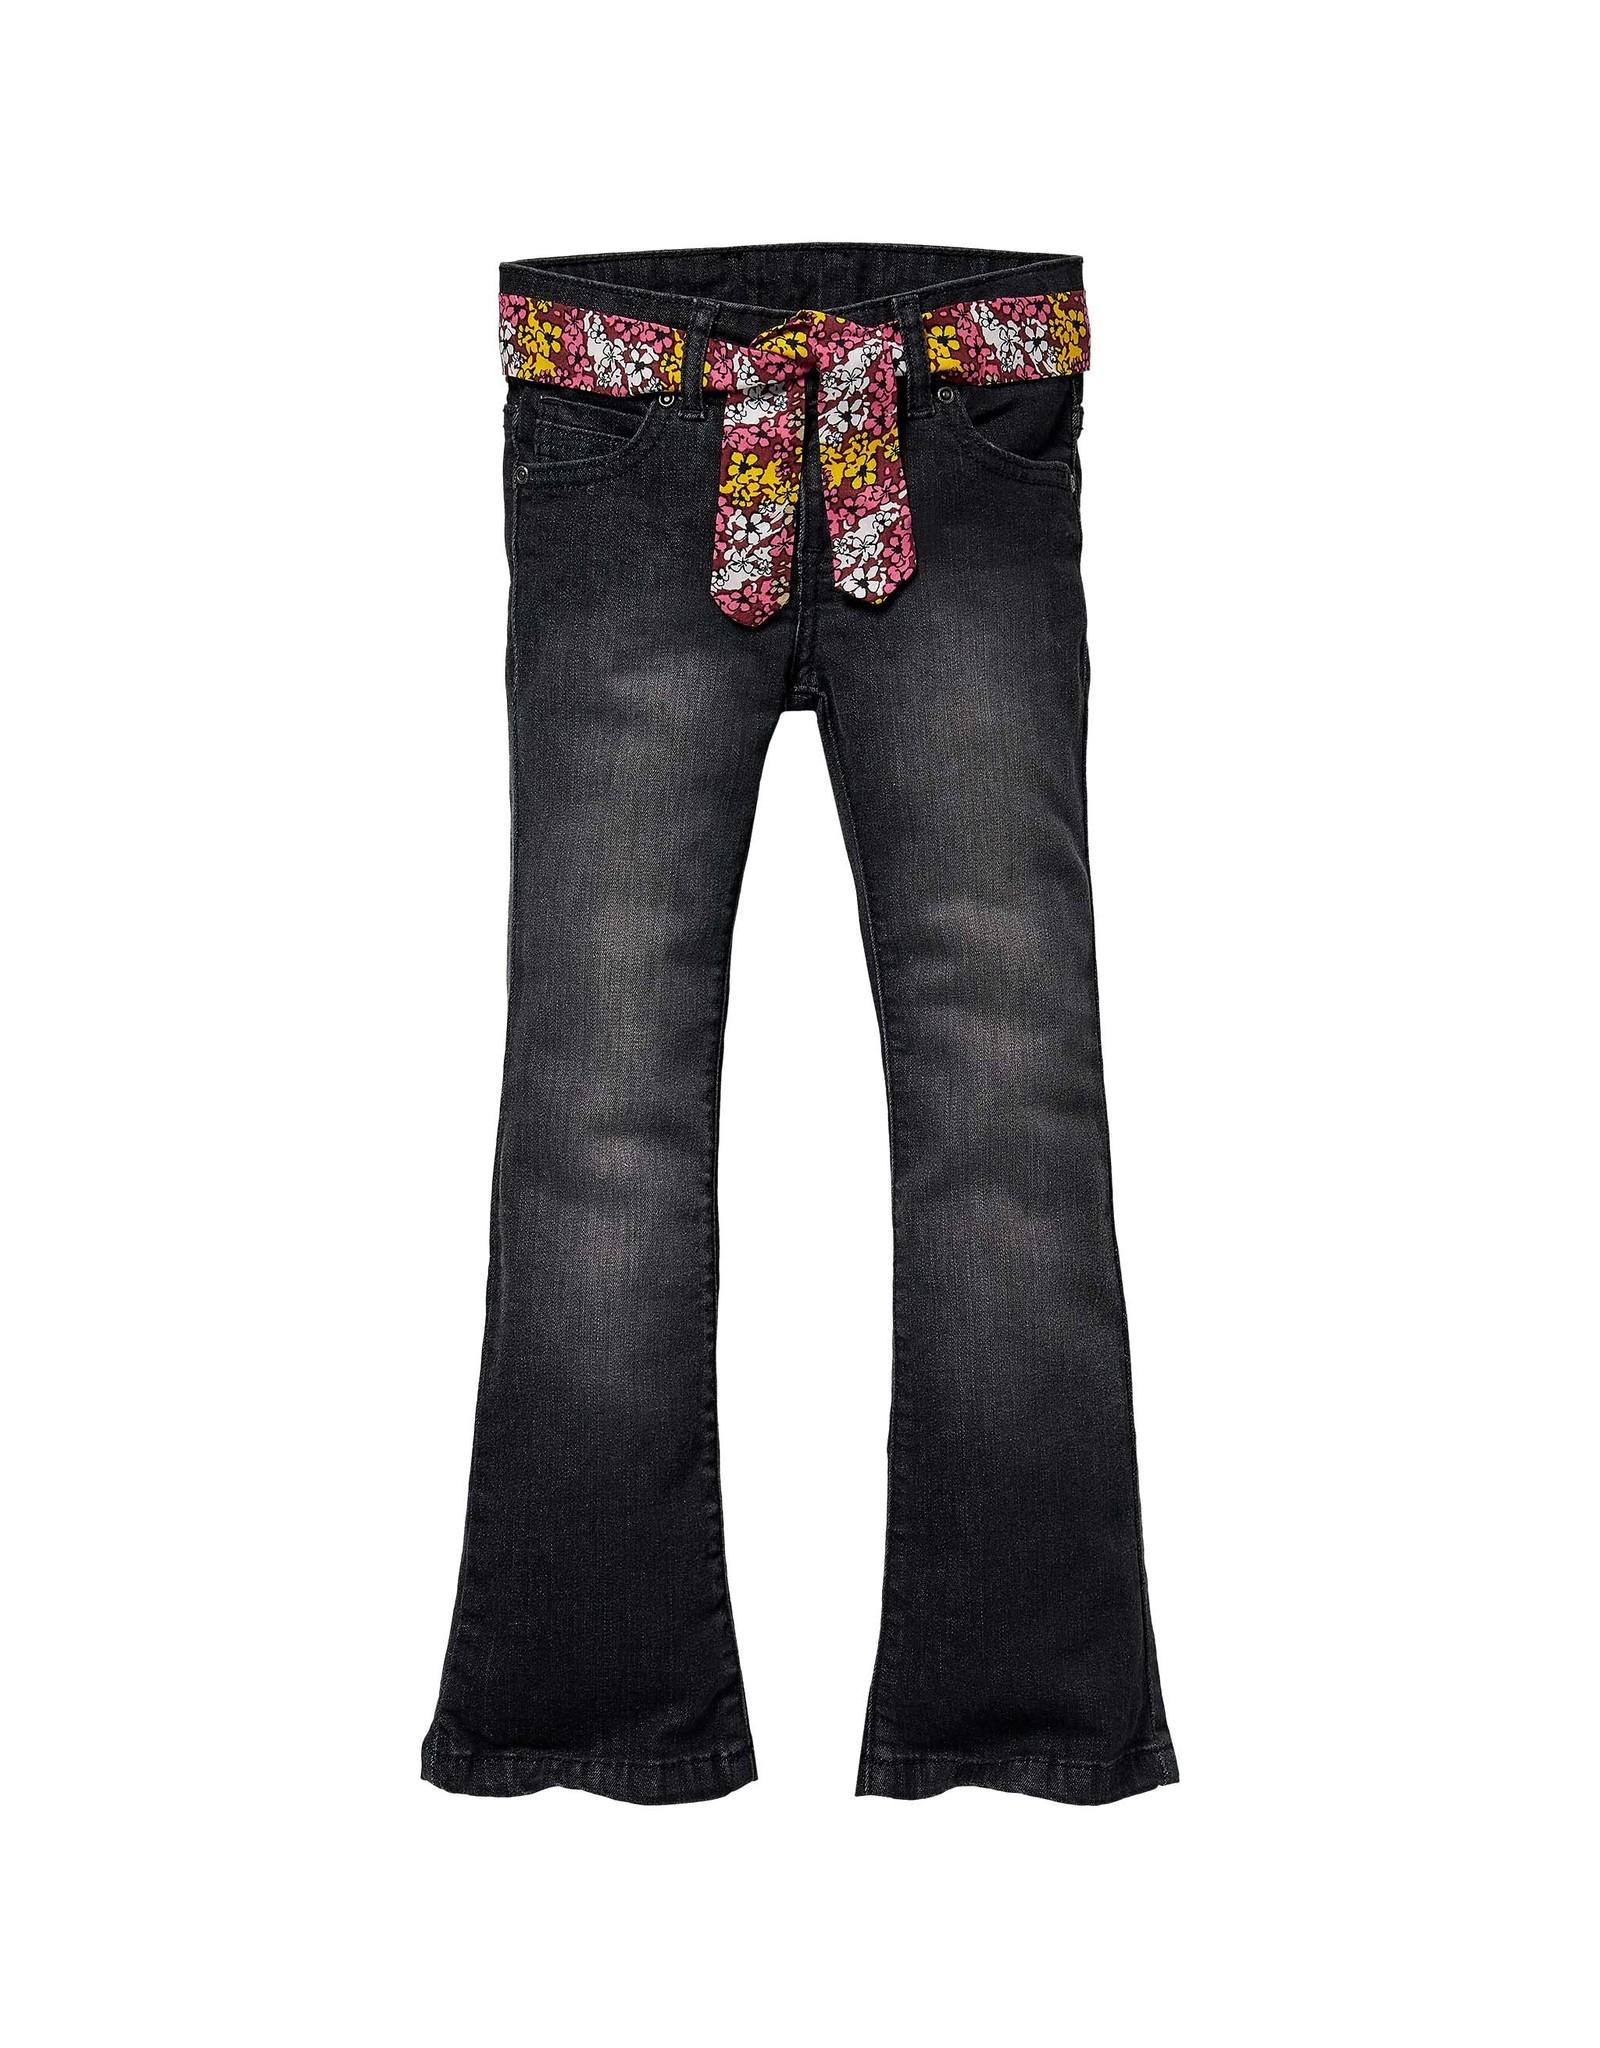 Quapi Quapi jeans Kianne black denim